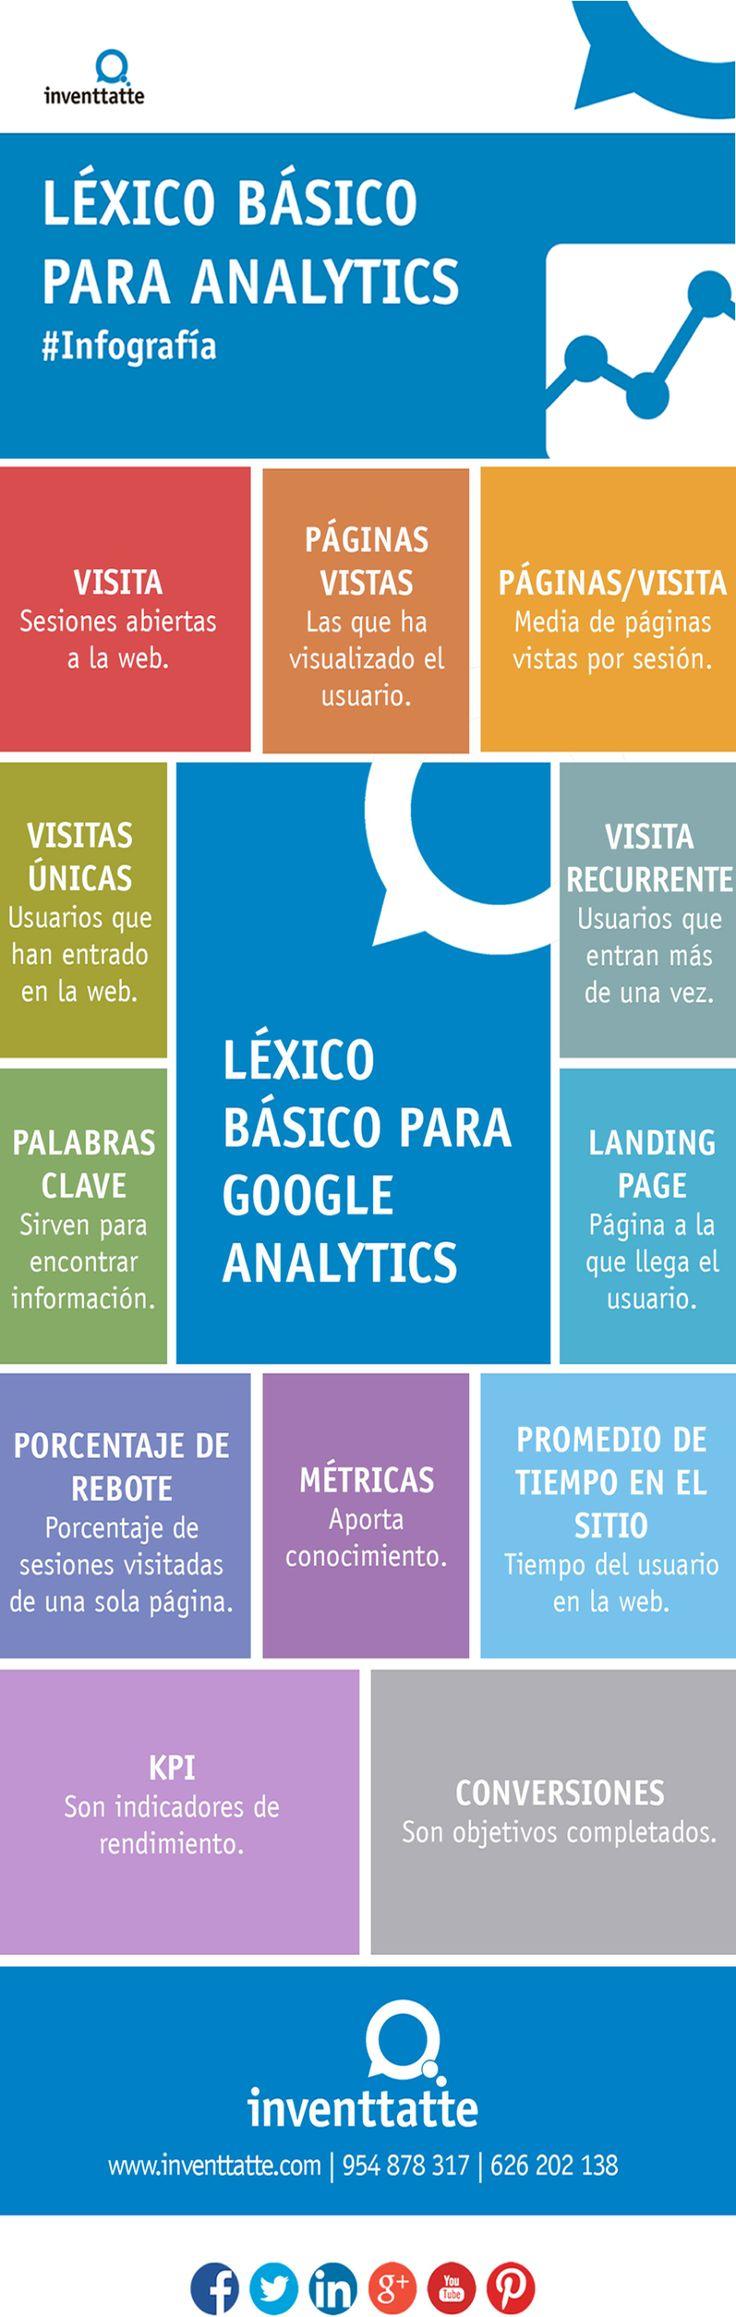 Léxico básico para Analytics #infografia #infographic #marketing